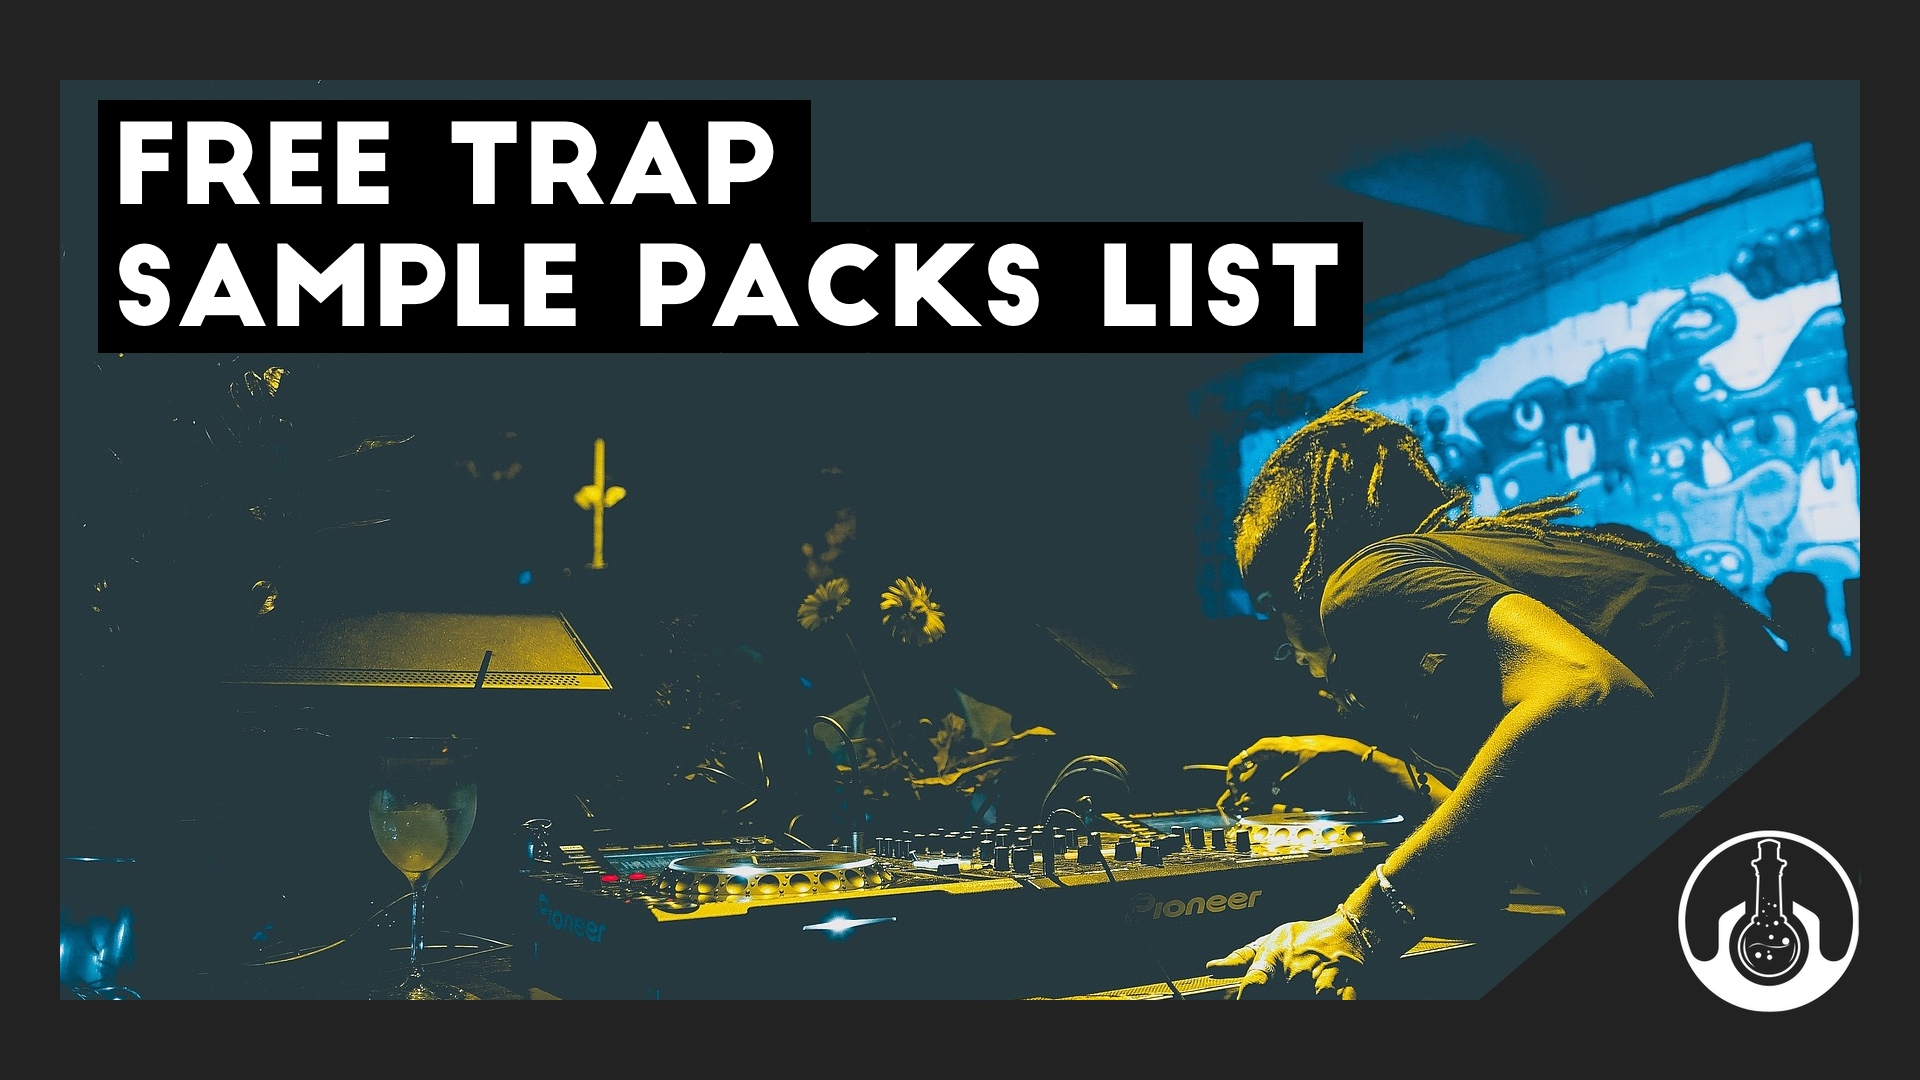 Free Trap Samples [Huge List of Free Trap Sample Packs]